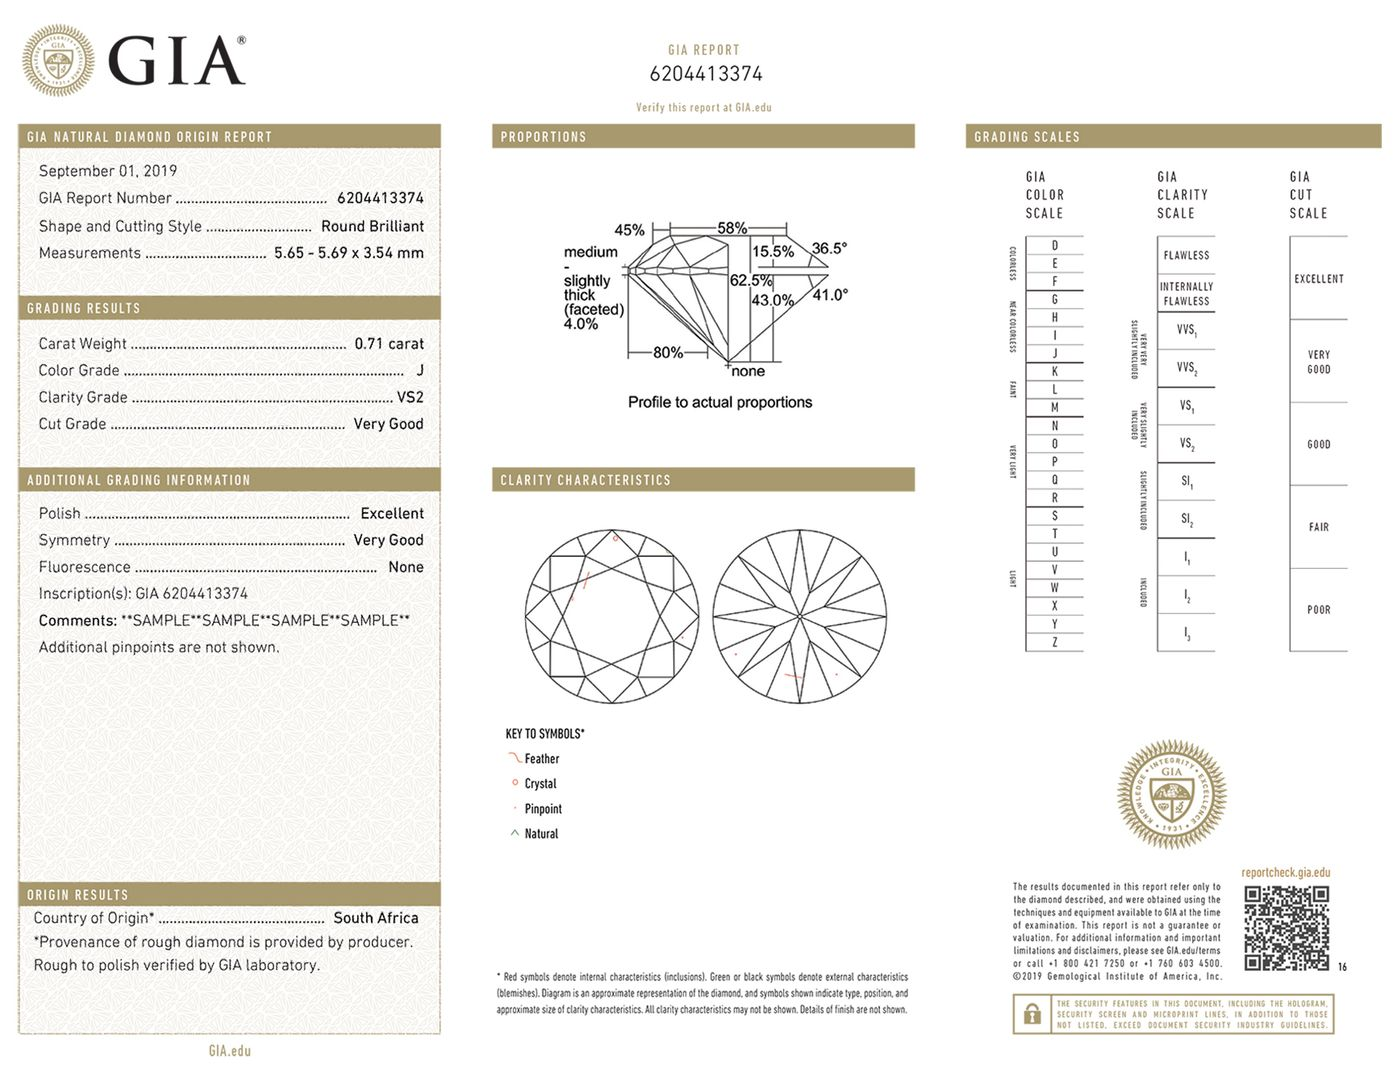 GIA Sample Certificate